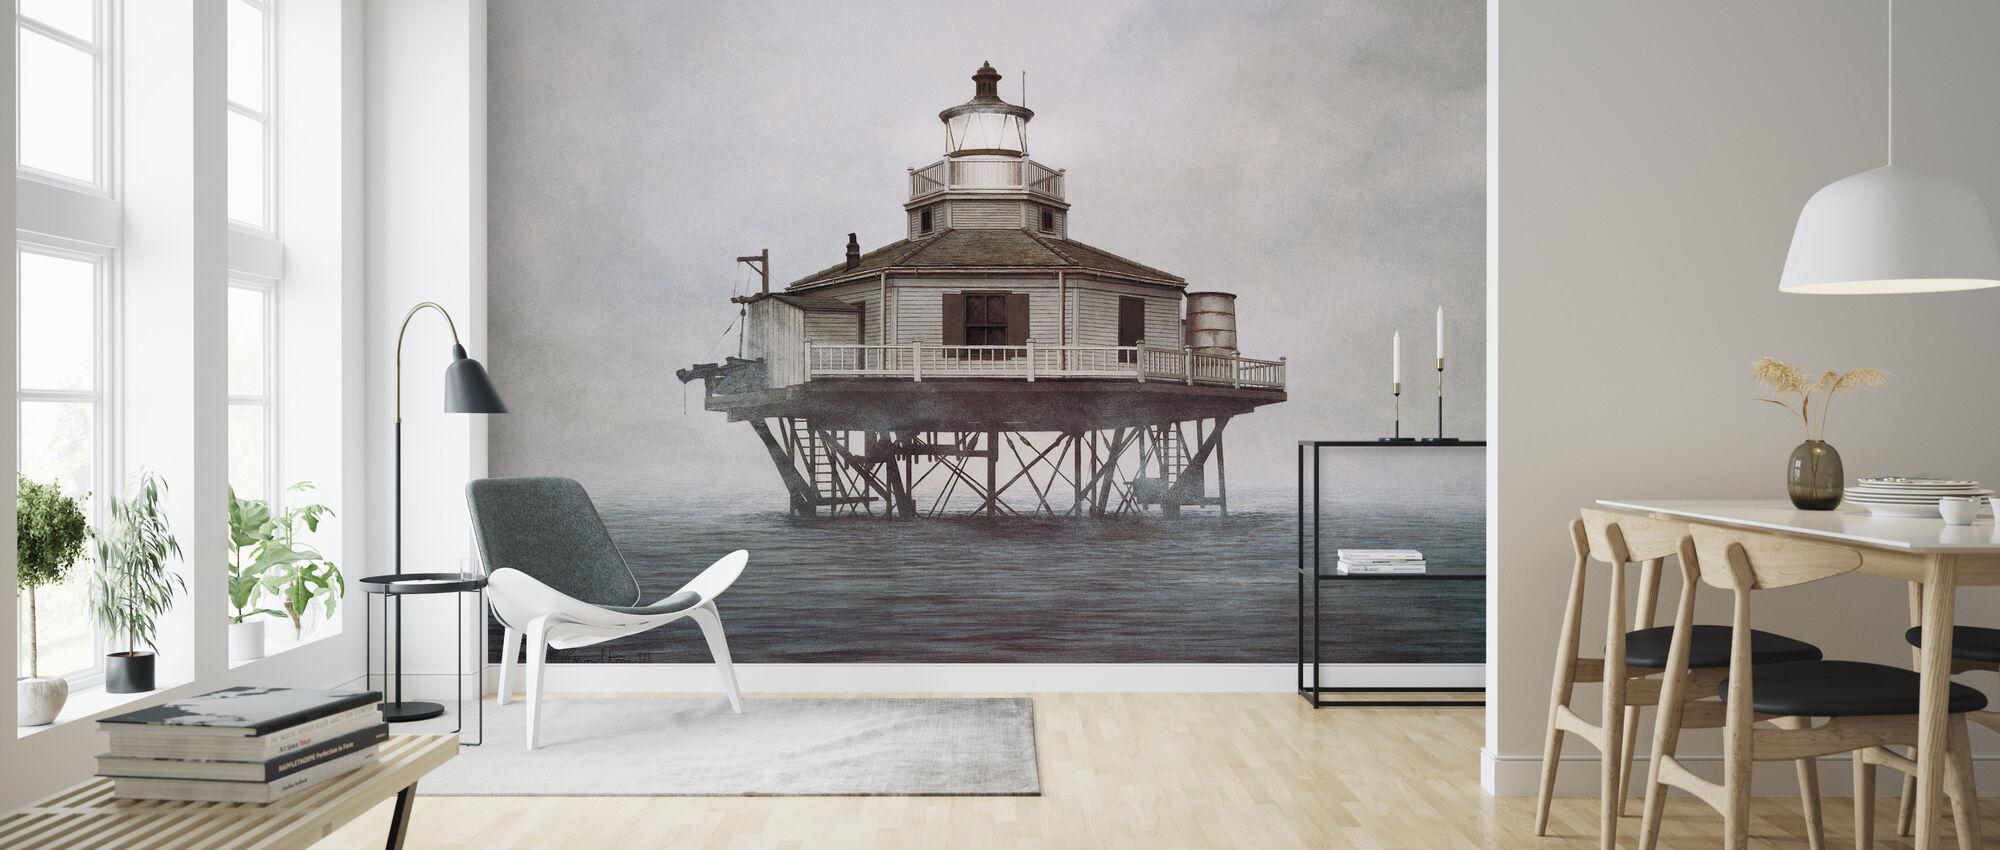 Half Moon Reef - Wallpaper - Living Room